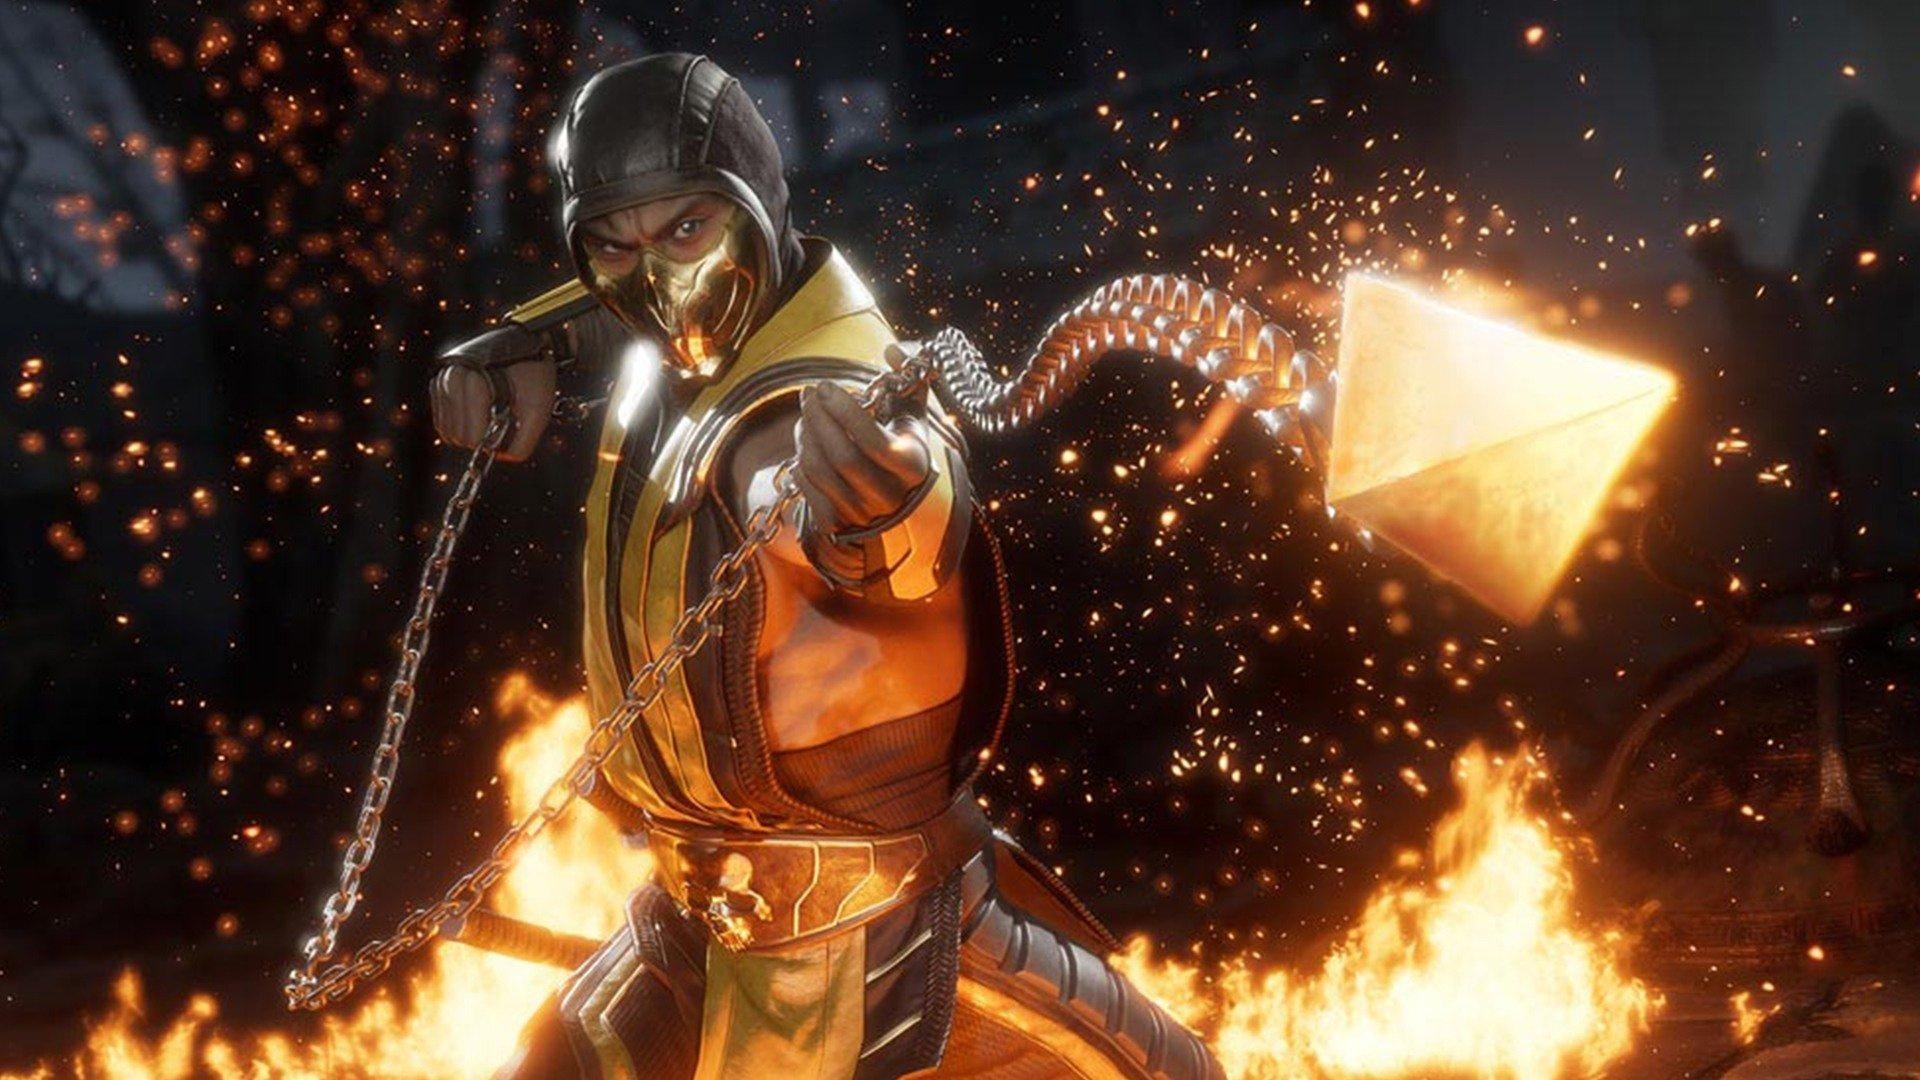 Mk11 4k Wallpaper: Mortal Kombat 11 PS4 Beta Announced, Access Locked To Pre